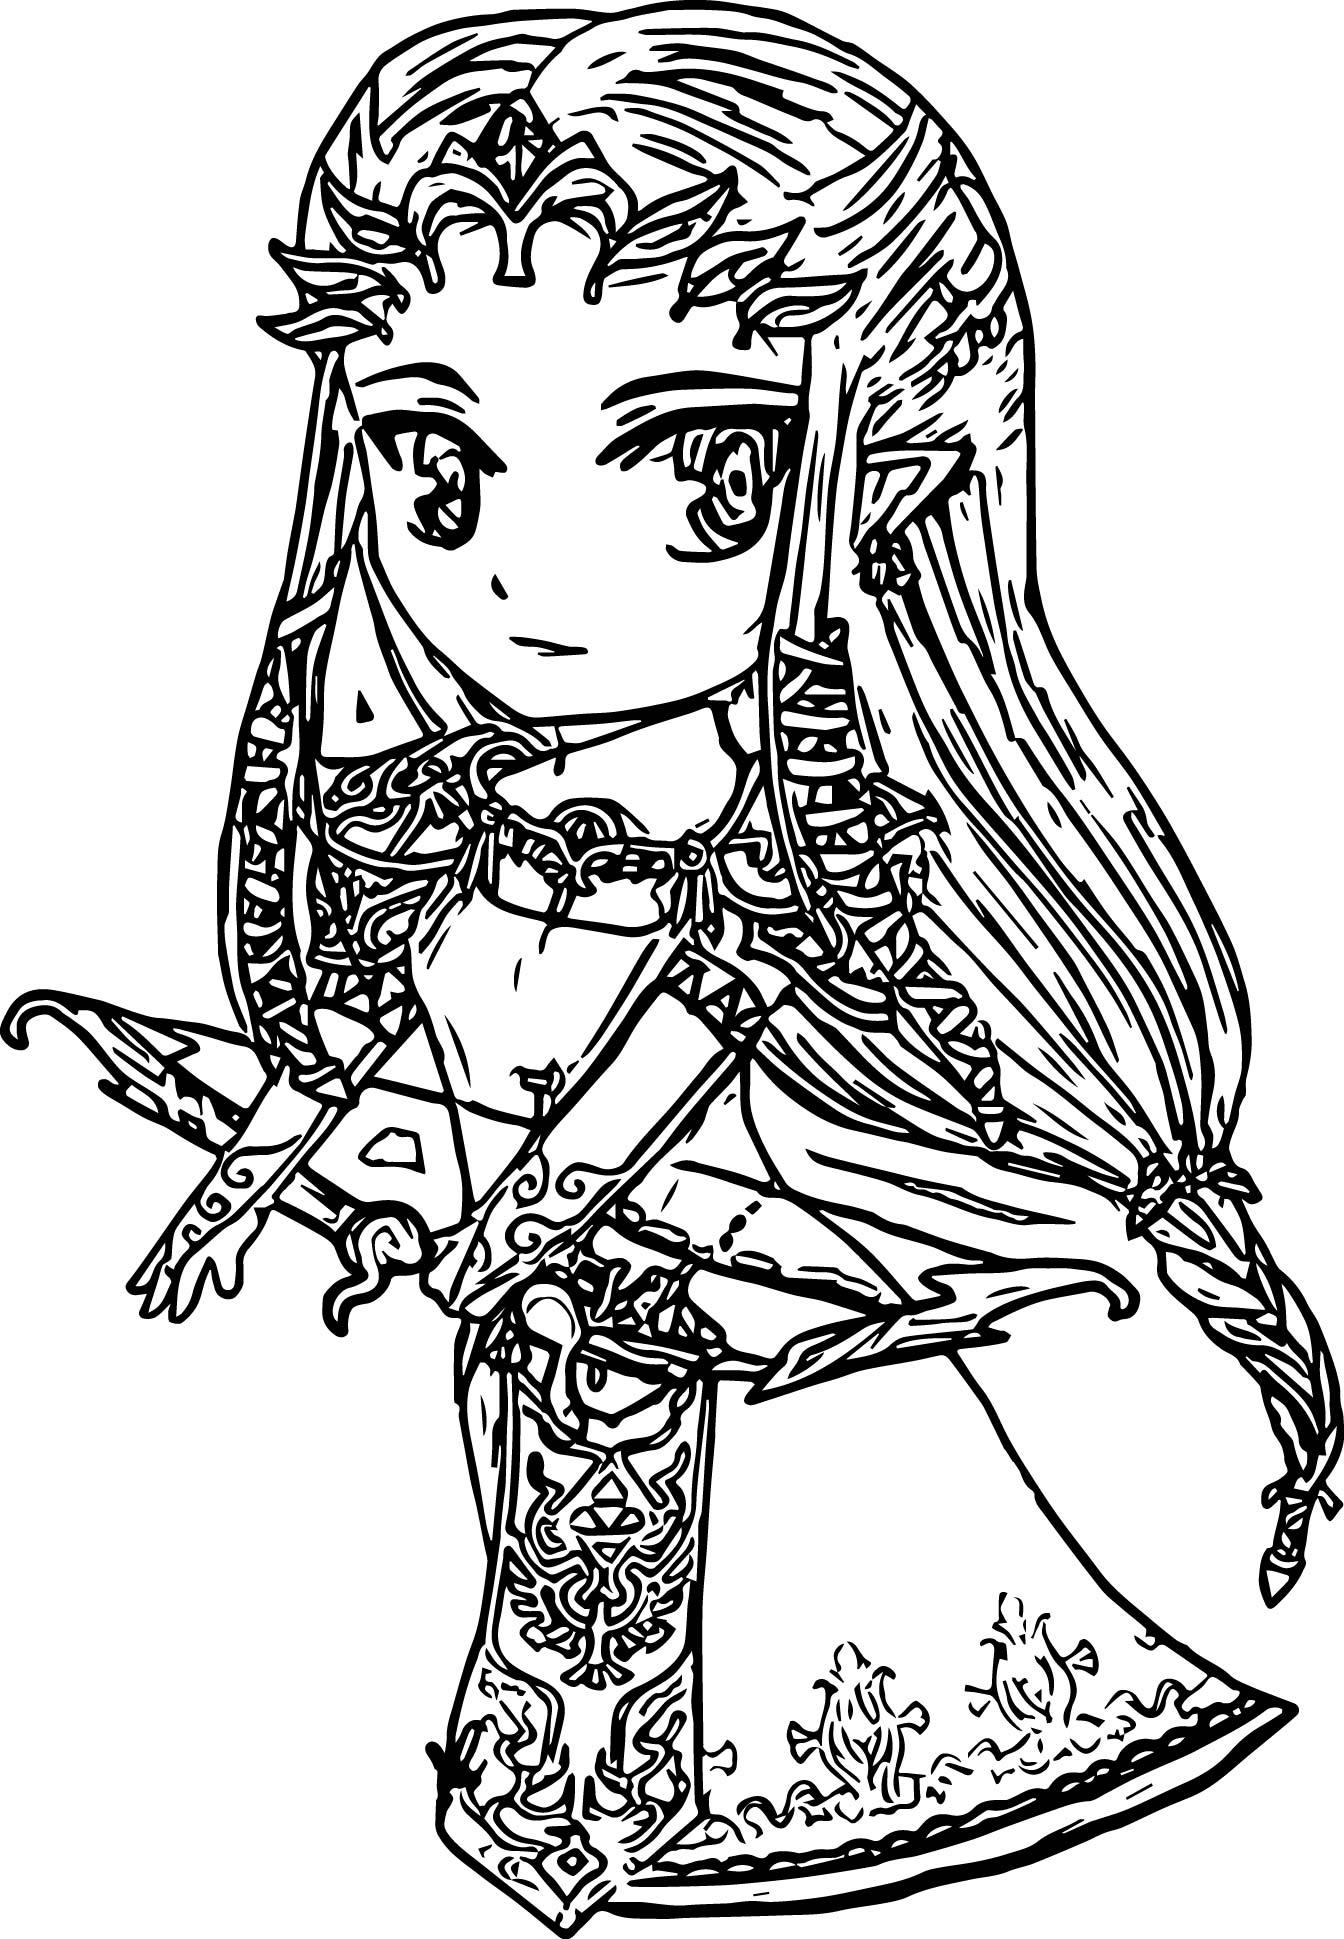 Chibi Zelda Twilight Princess Coloring Page Wecoloringpage